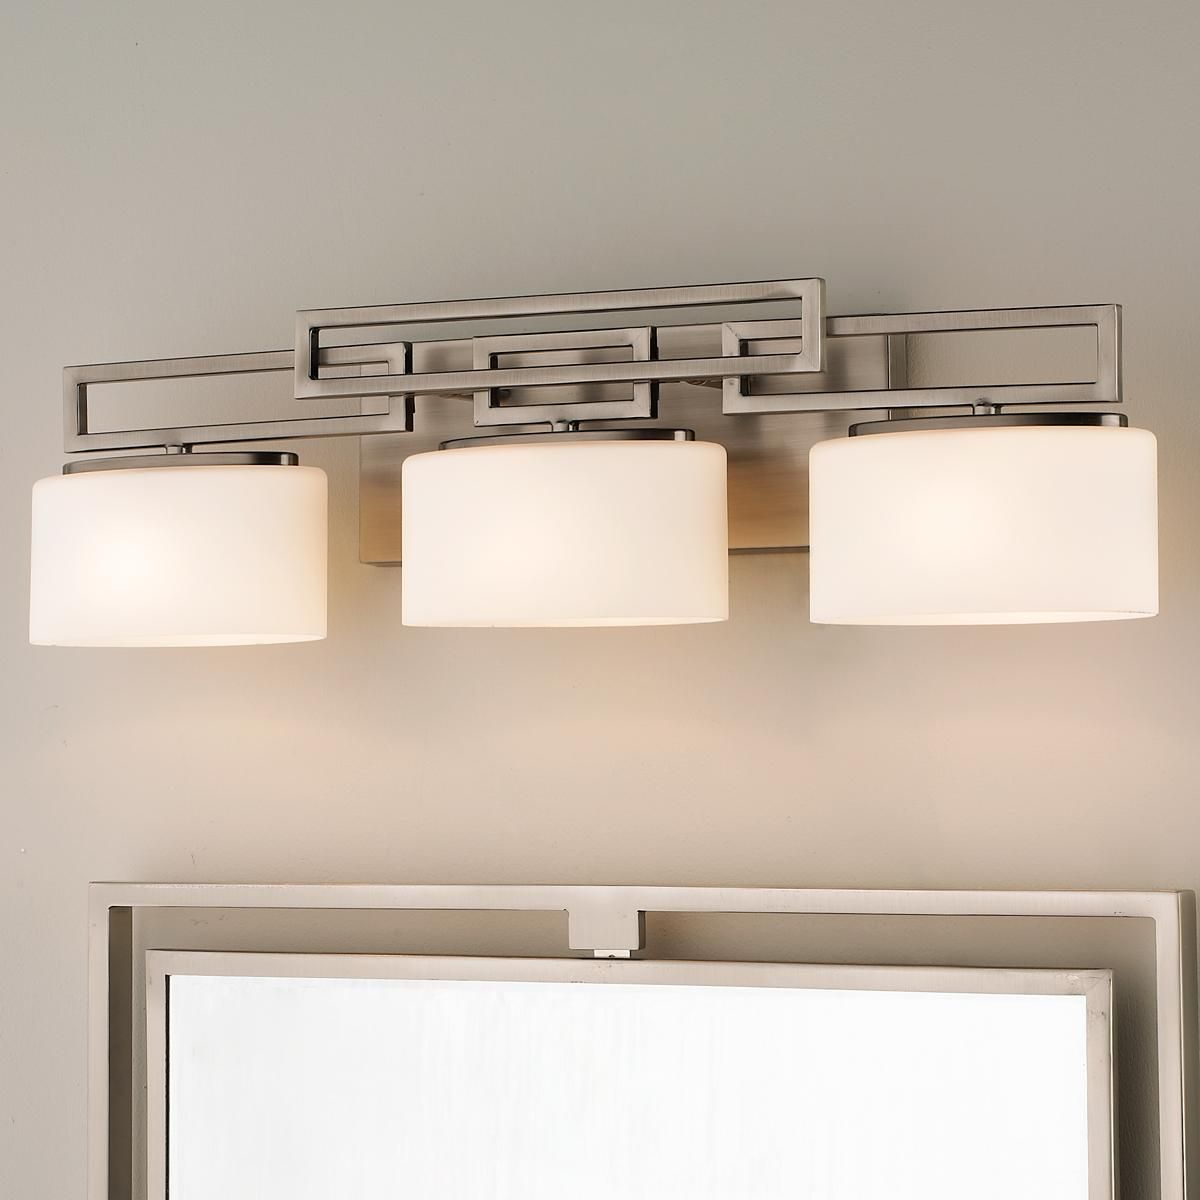 Modern Grid Bath Light 3 Light Black Bathroom Light Fixtures Traditional Bathroom Lighting Hanging Light Fixtures